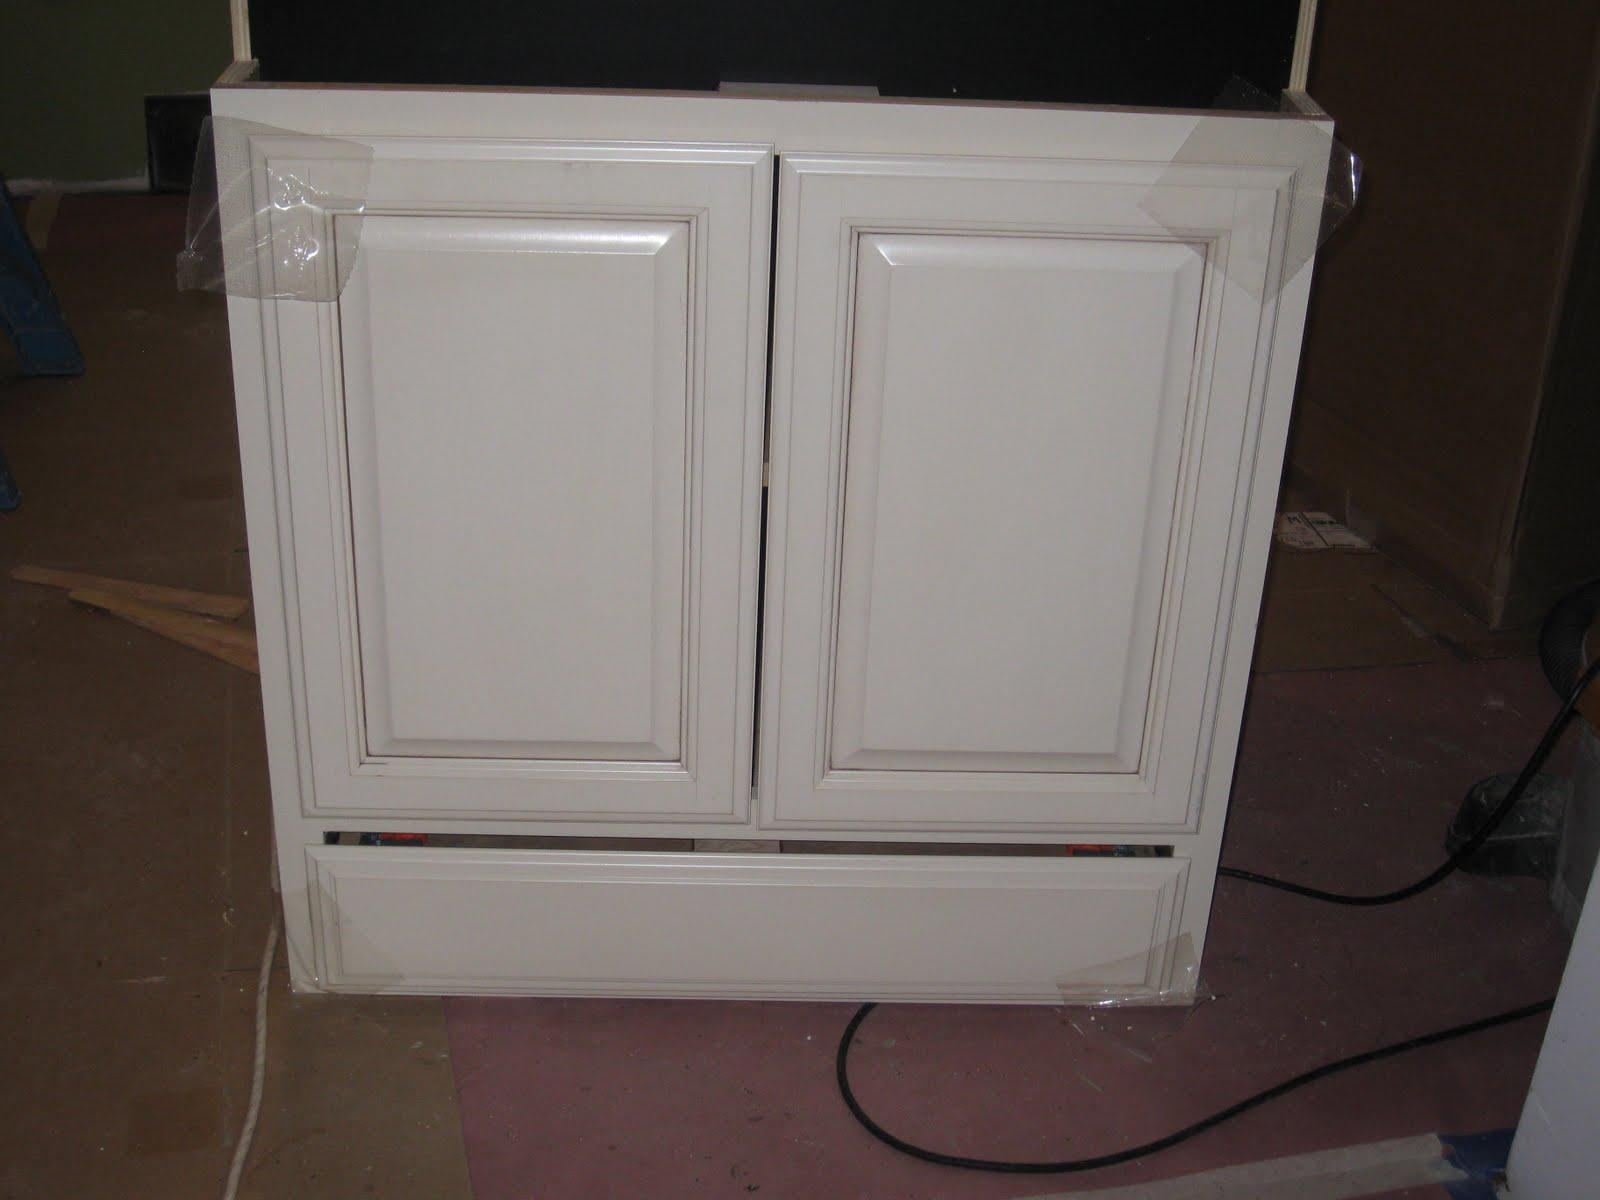 Biscotti with Cocoa Glaze Cabinets